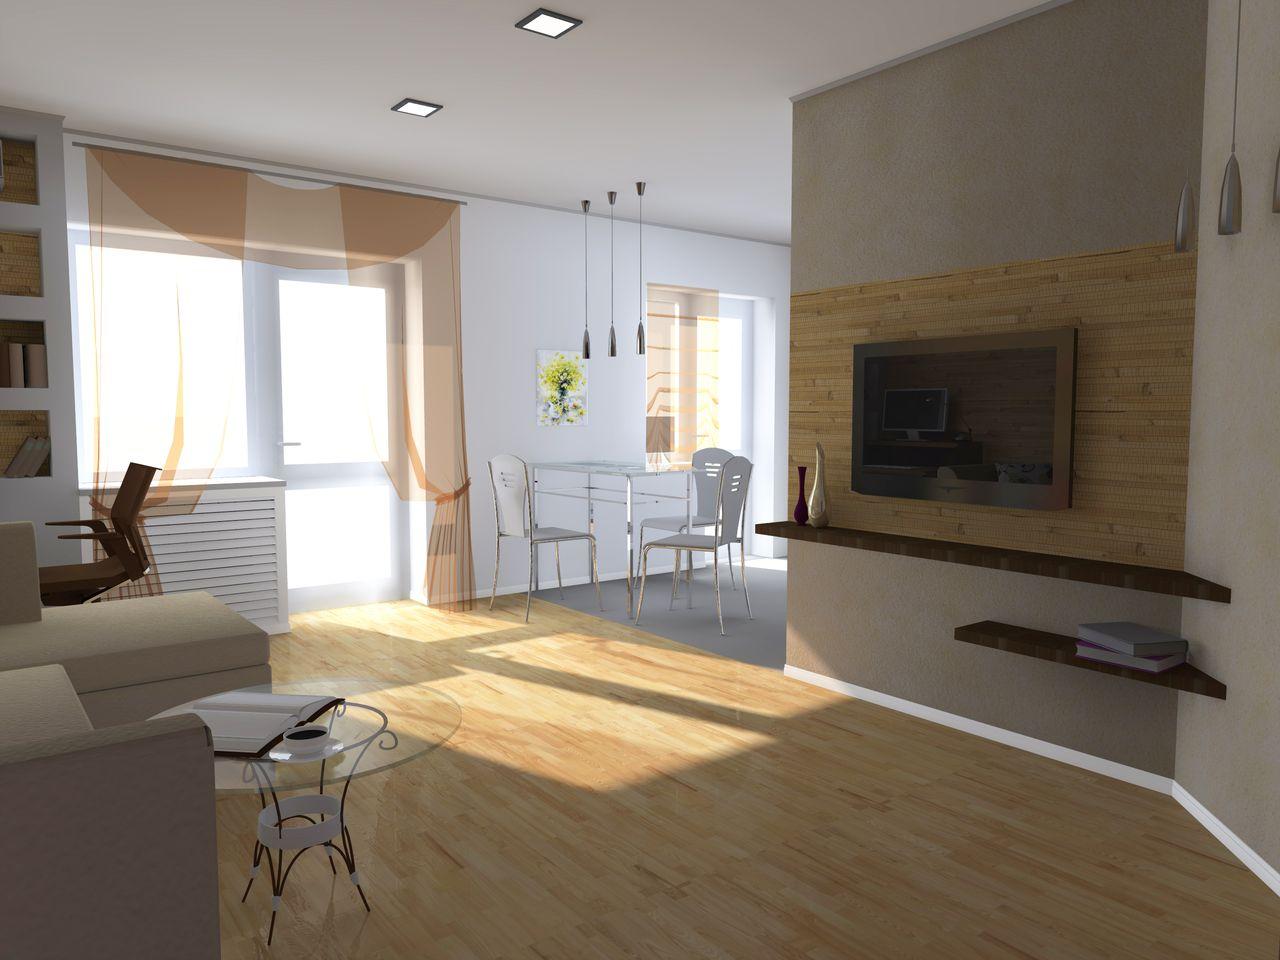 Разработка дизайна квартиры - Гостевая комната вид 4